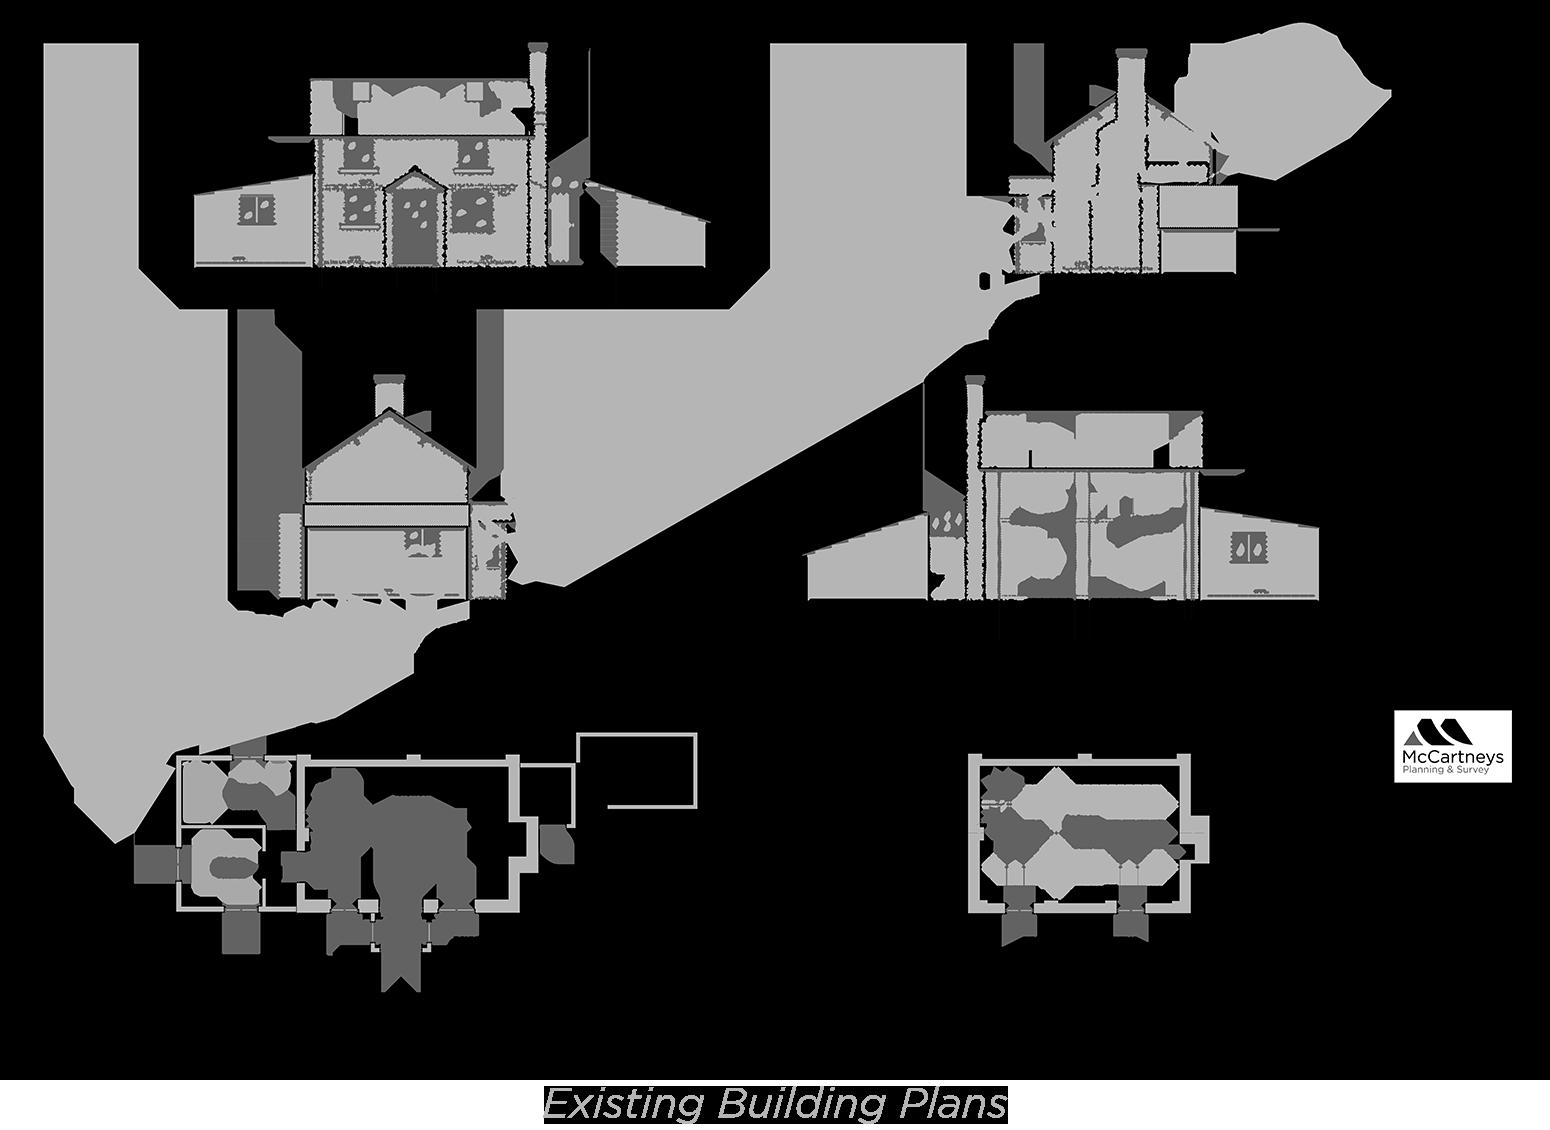 Existing Building Plans